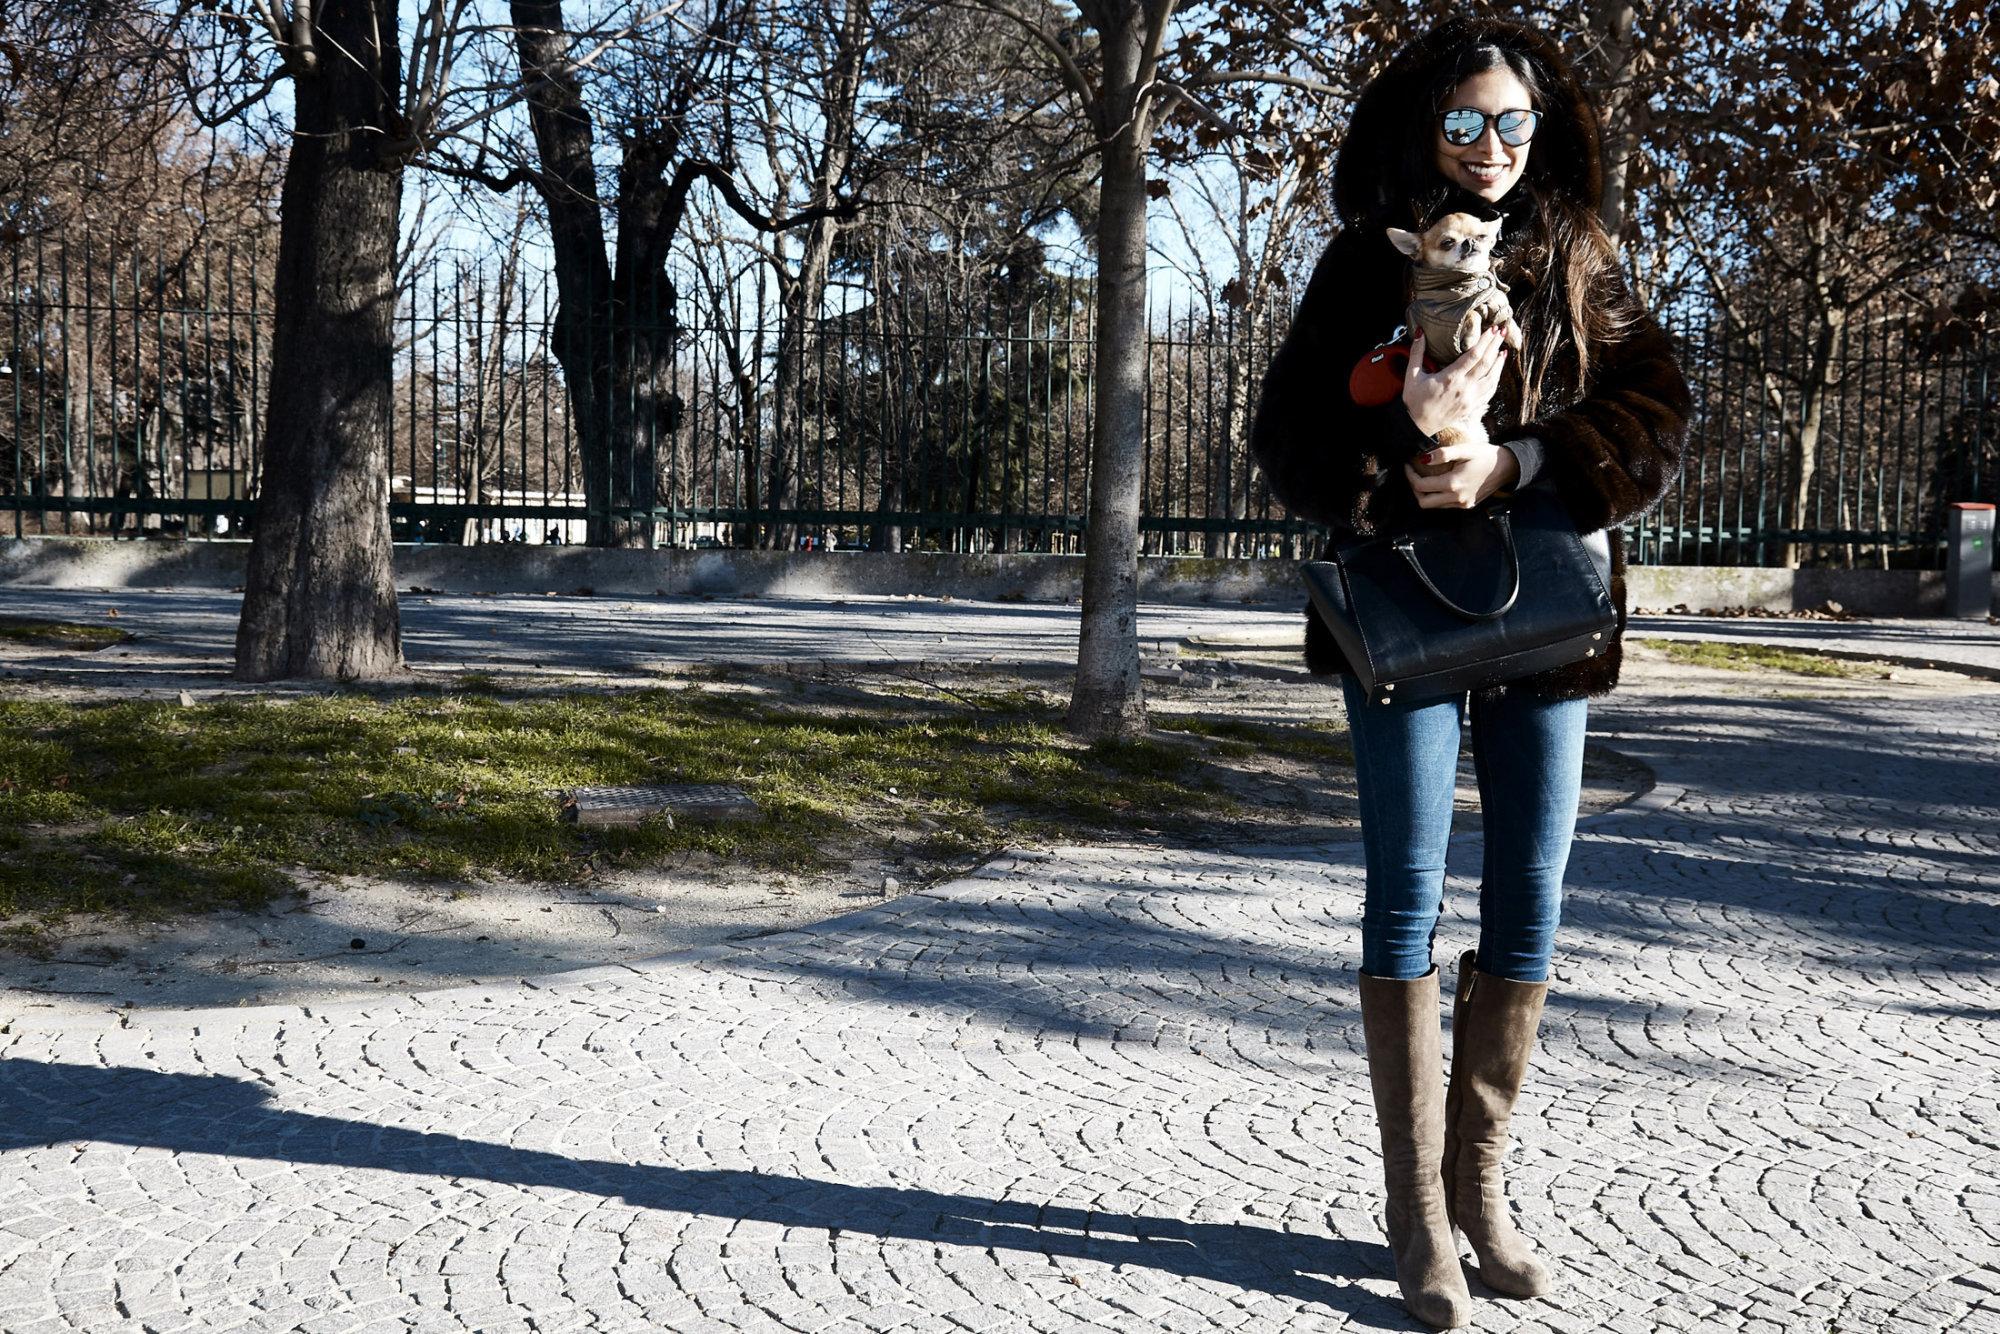 Lucia + Marlene, the Chihuahua